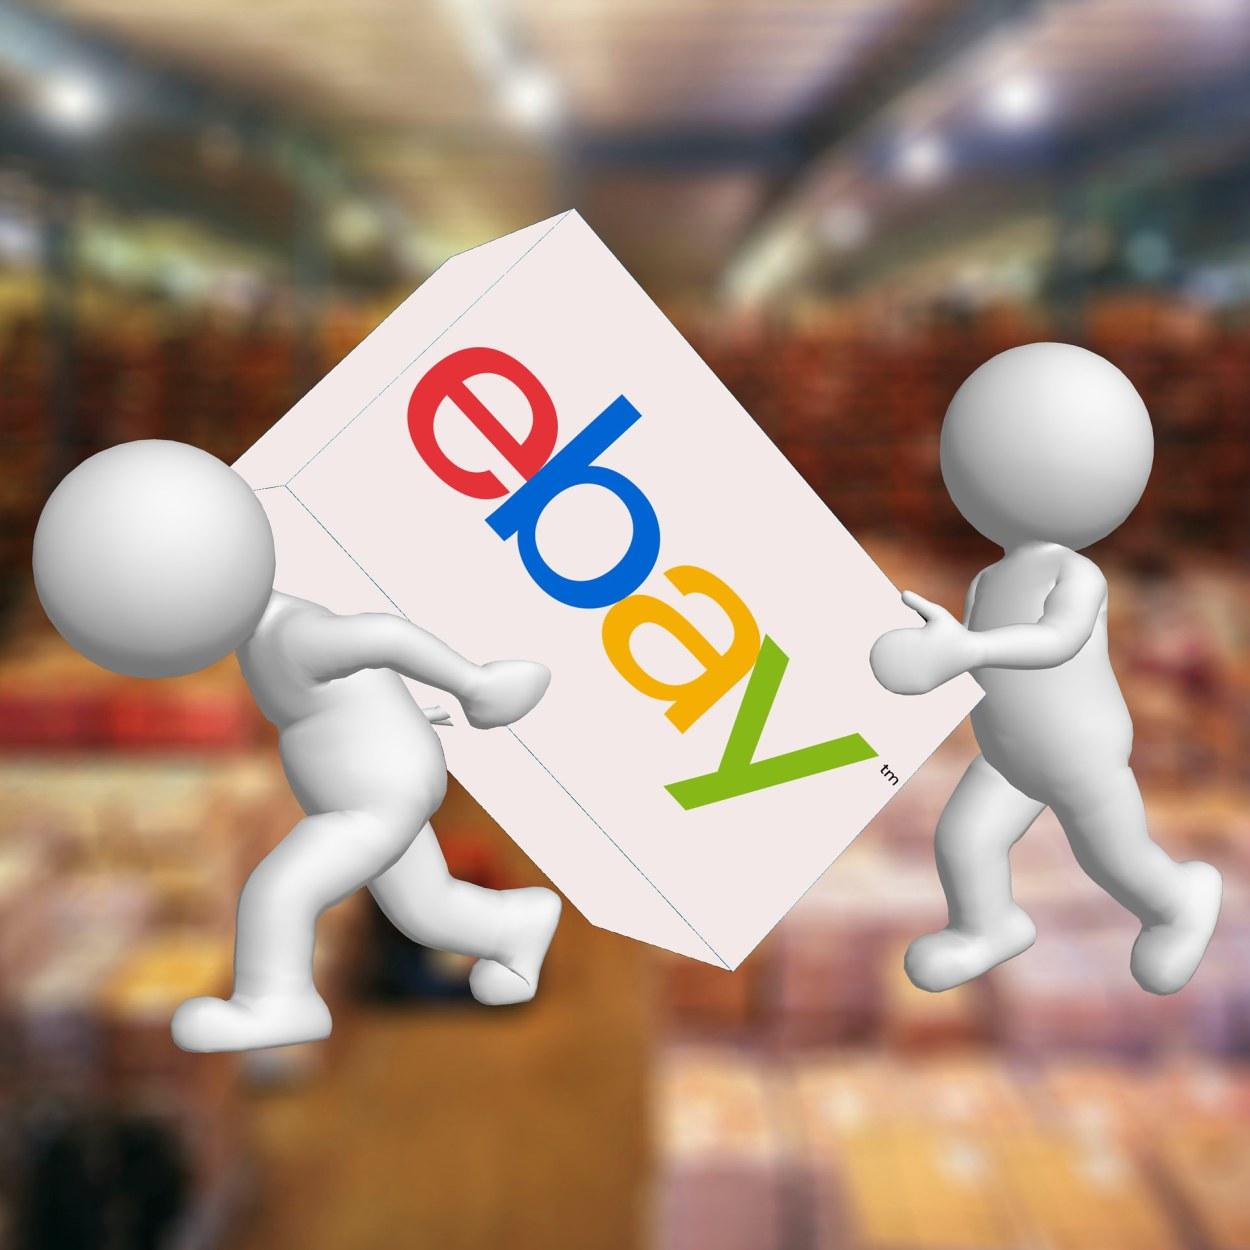 10 Tips on Preparing Photos for eBay